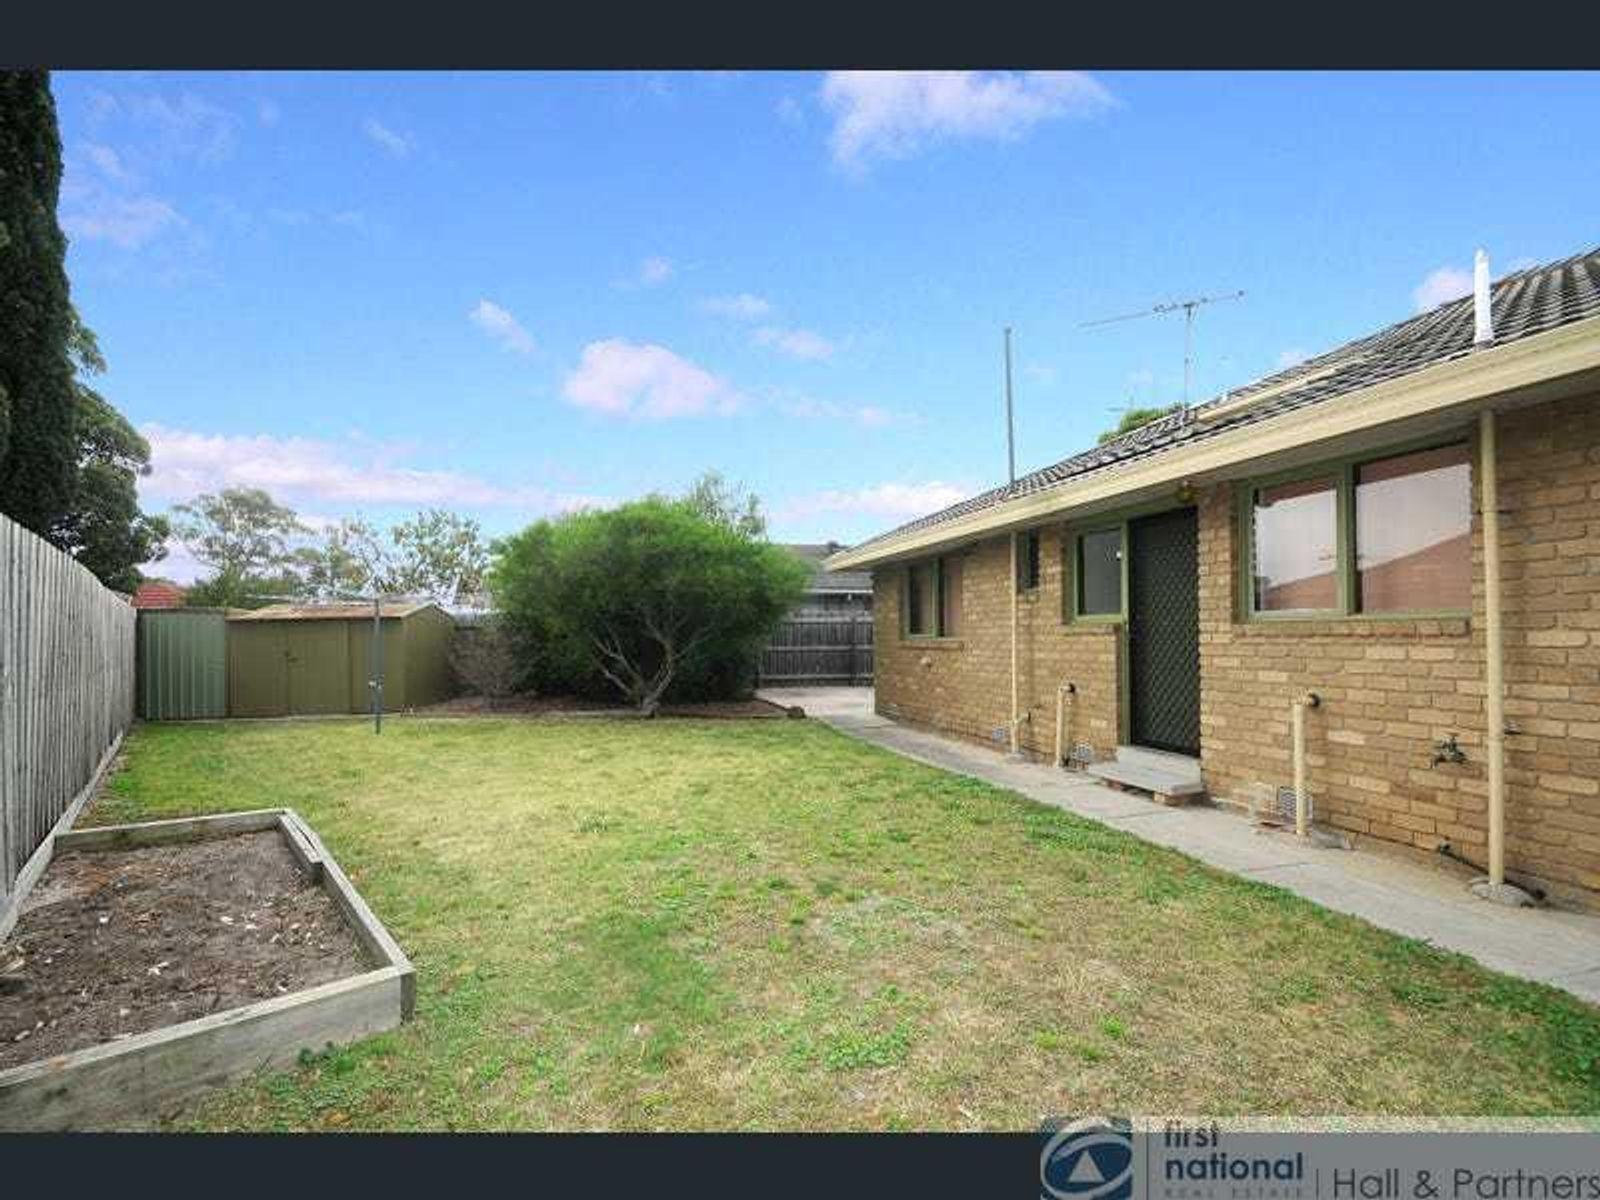 1 Garden Court, Keysborough, VIC 3173